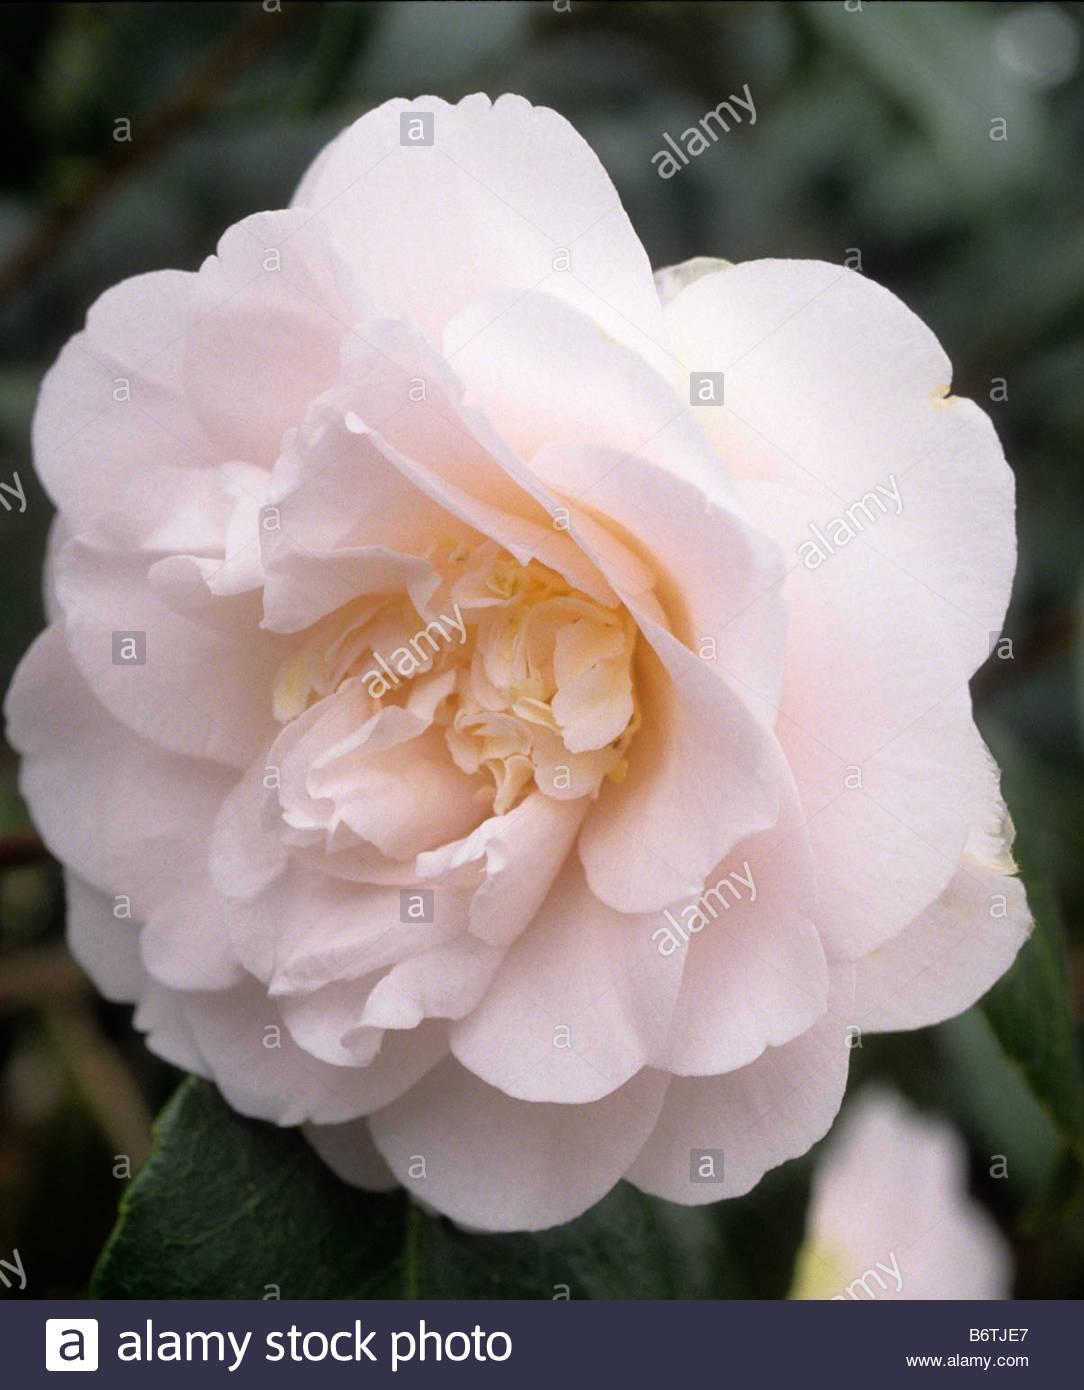 Camellia japonica Elsa - Stock Image